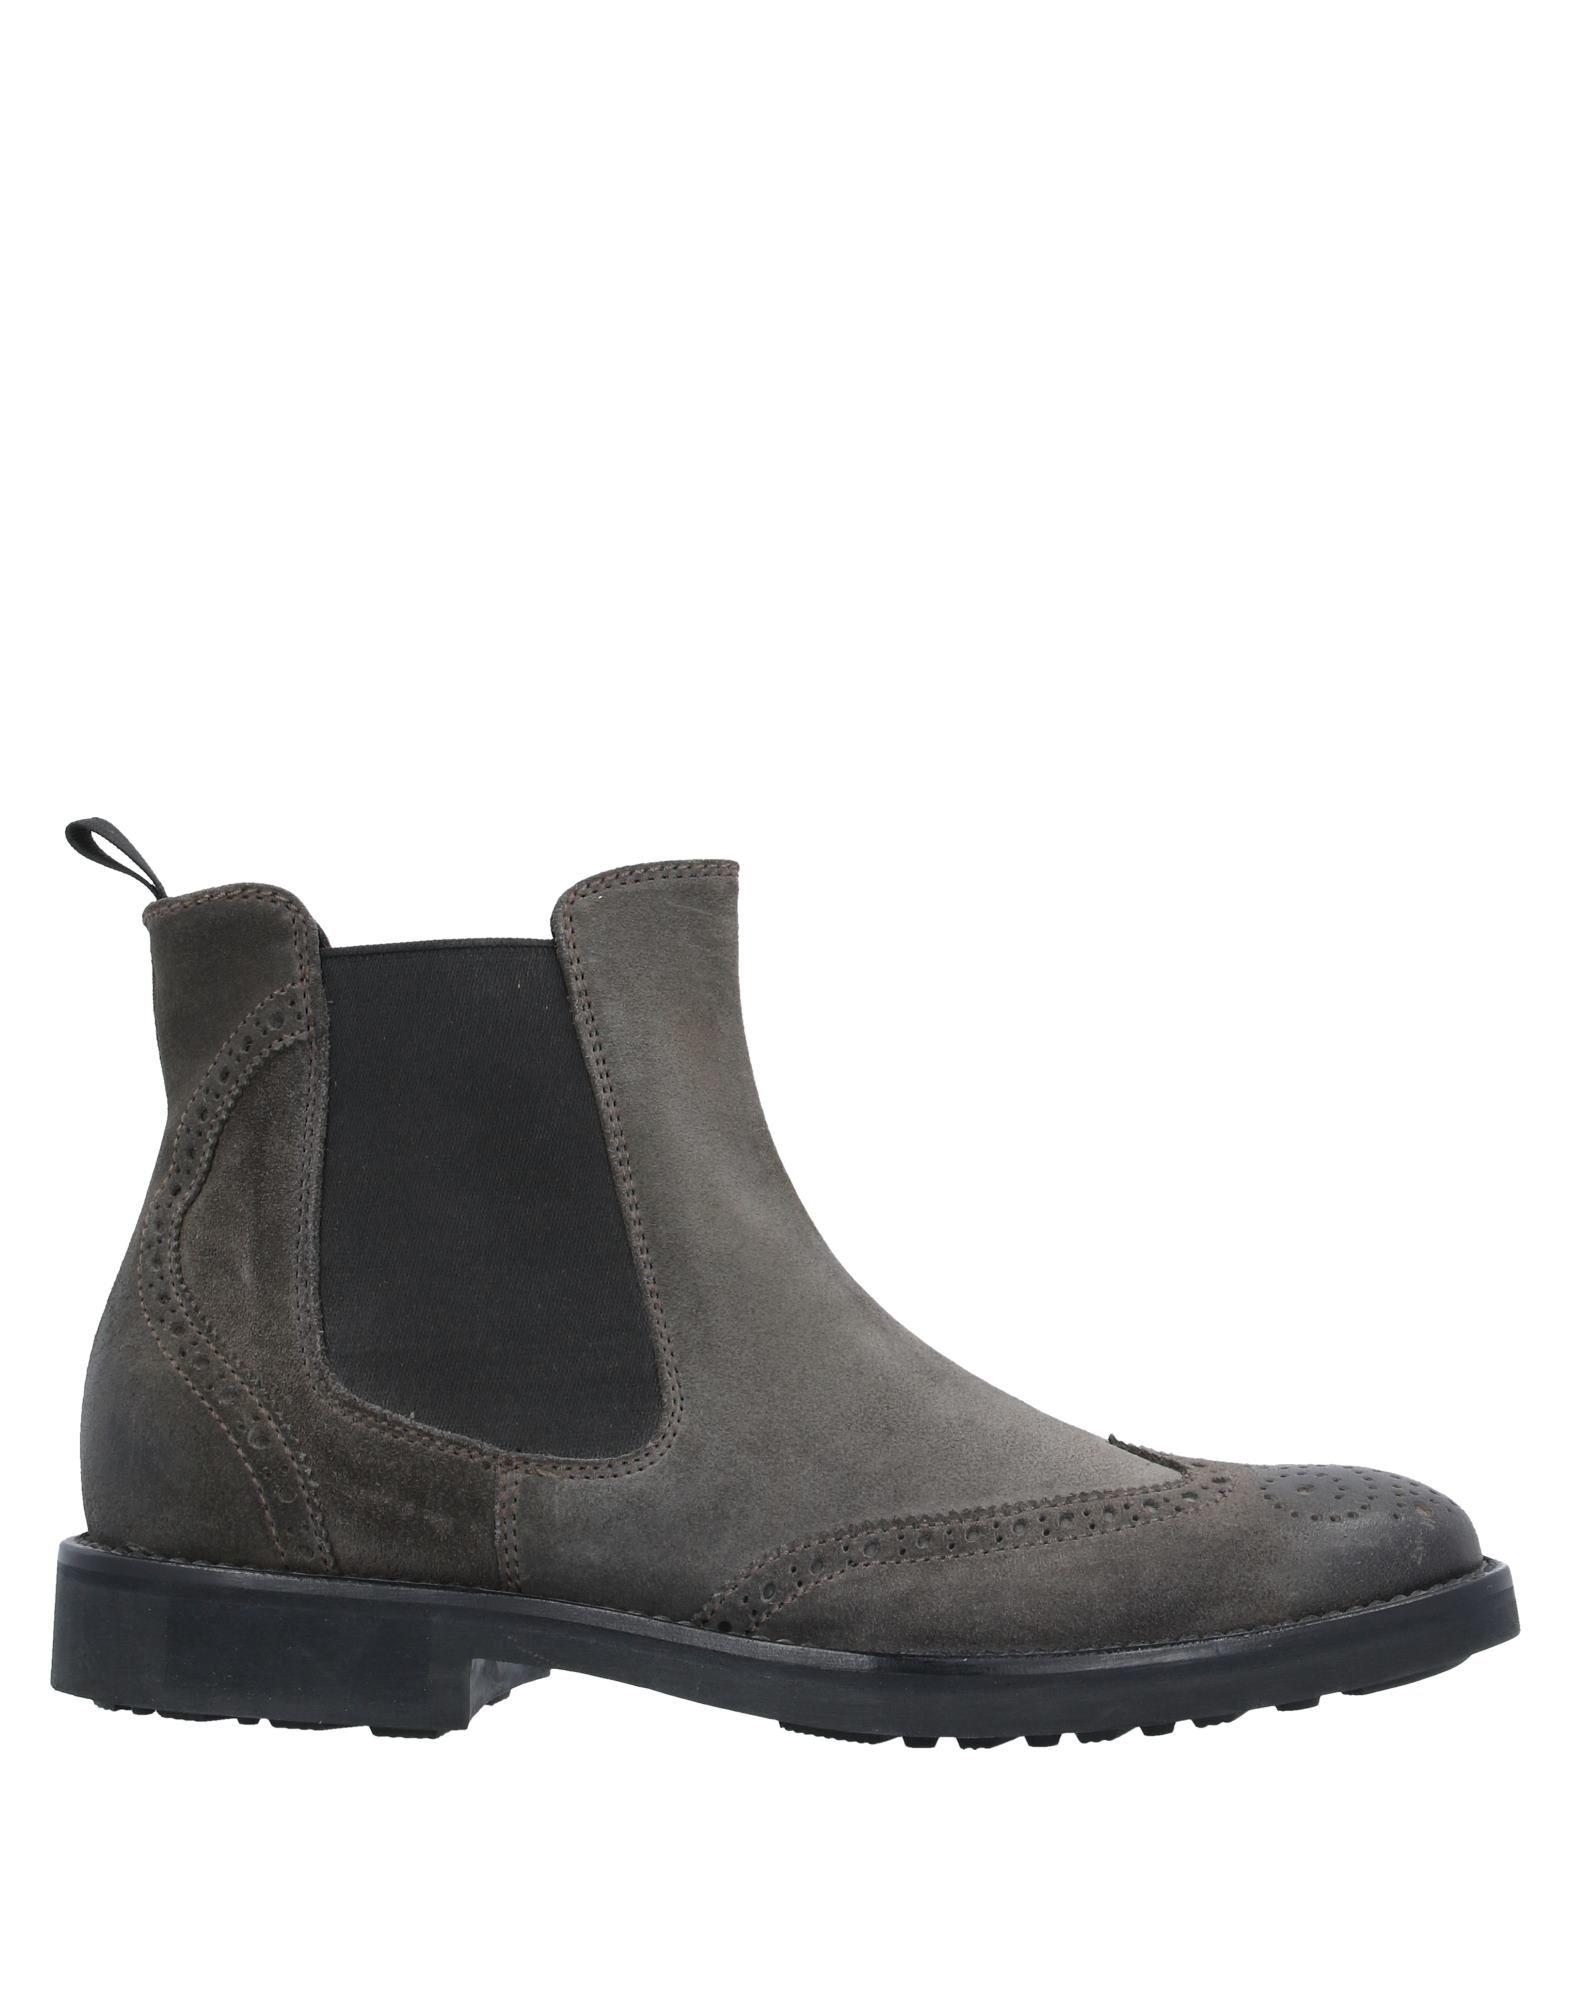 MICHELE BAGGIO Полусапоги и высокие ботинки michele baggio мокасины